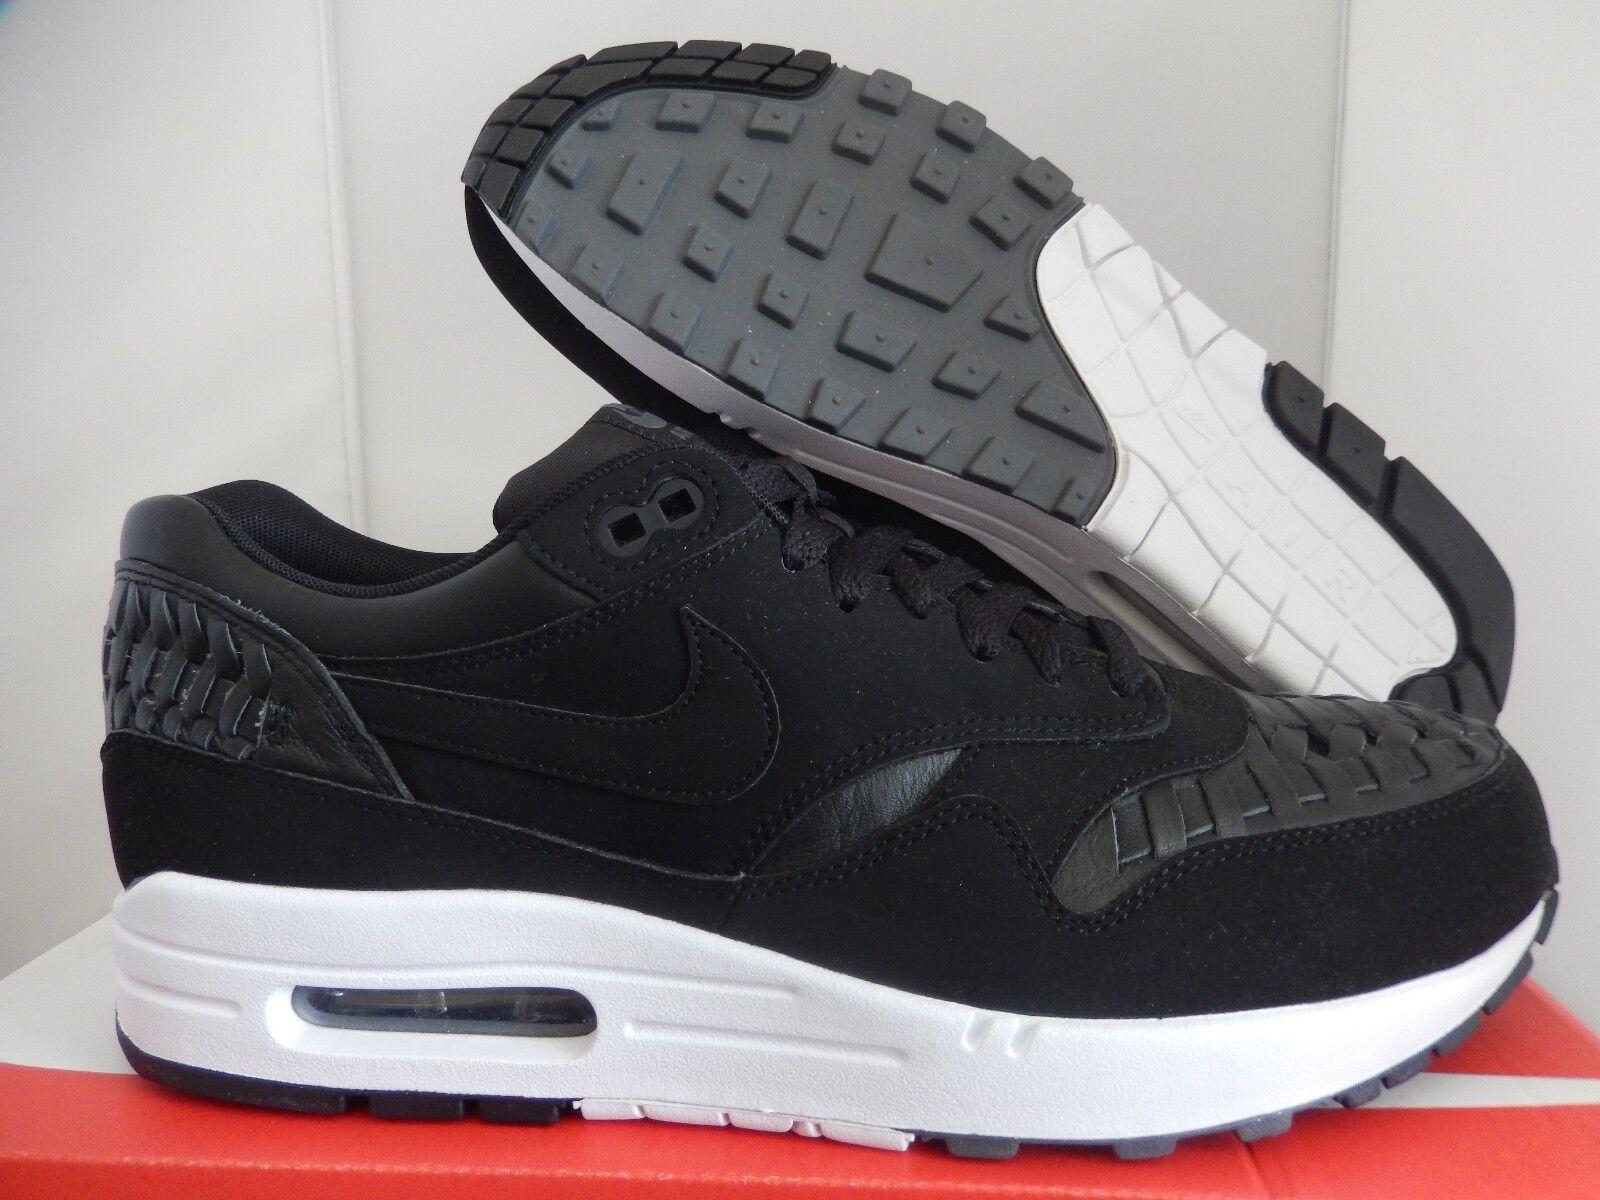 Nike max mens LTD 3 premium white mens max running sneakers Size 14 6b2e1f